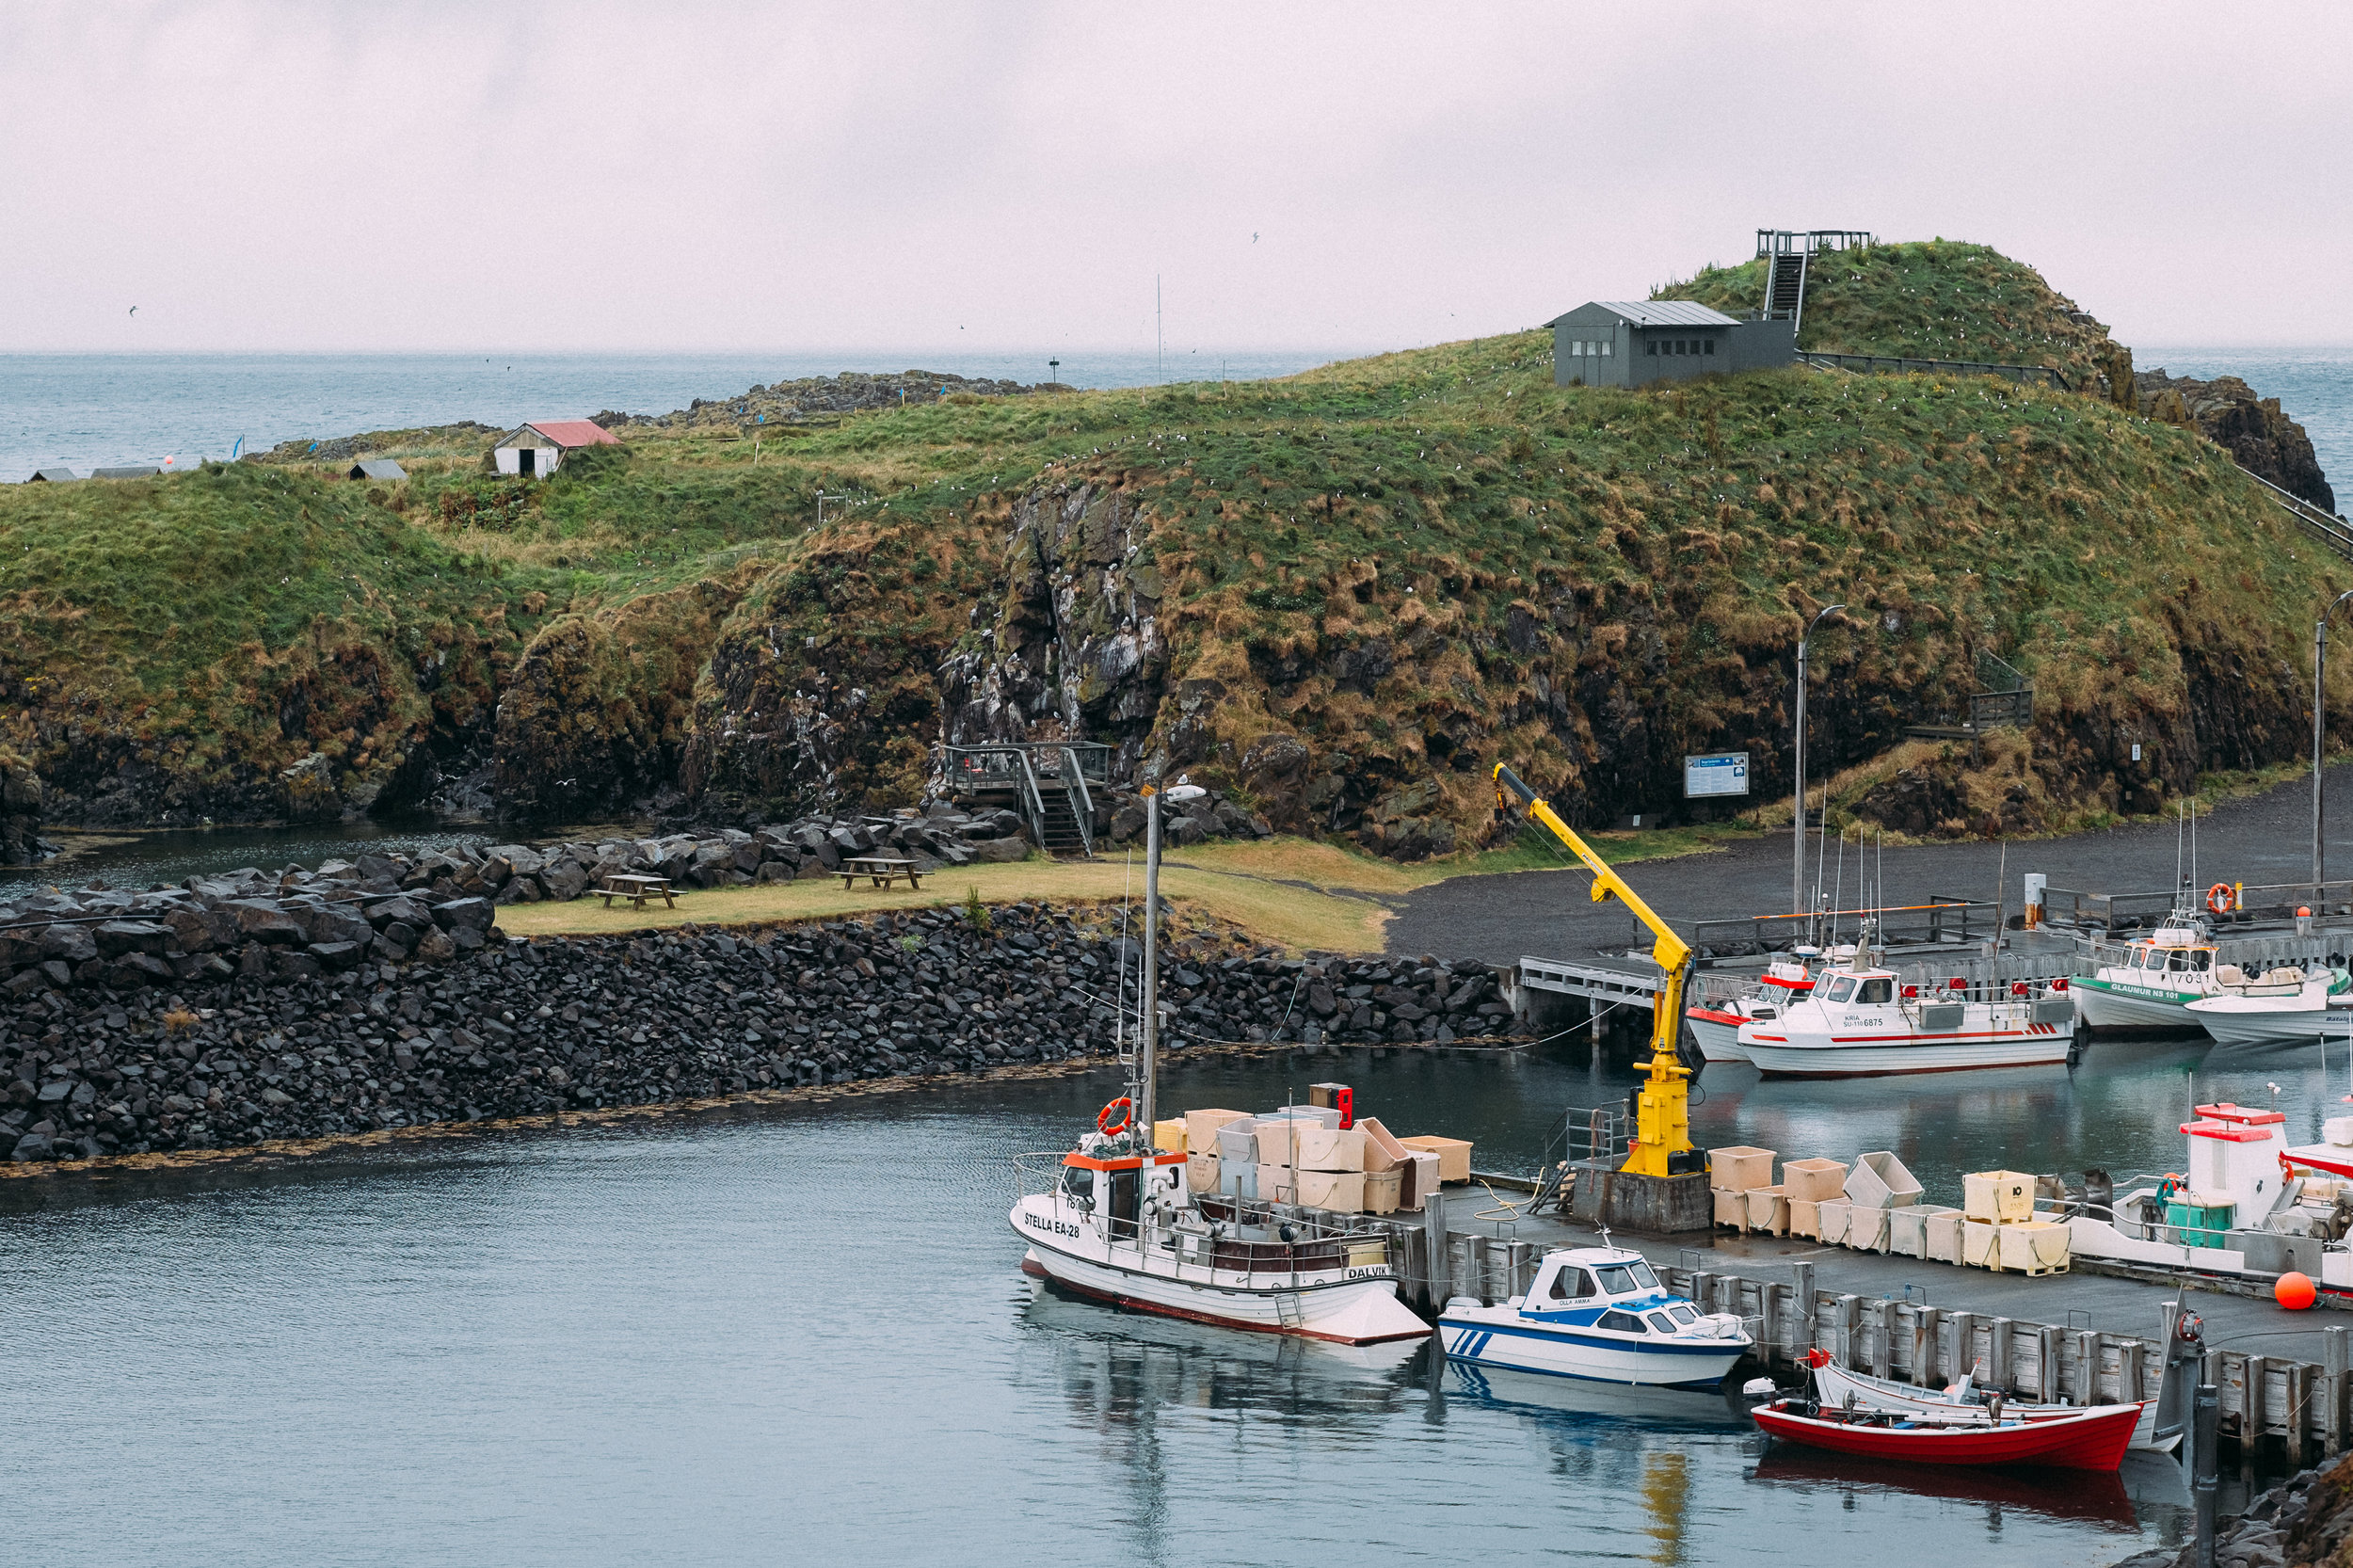 Puffin island, behind the marina.